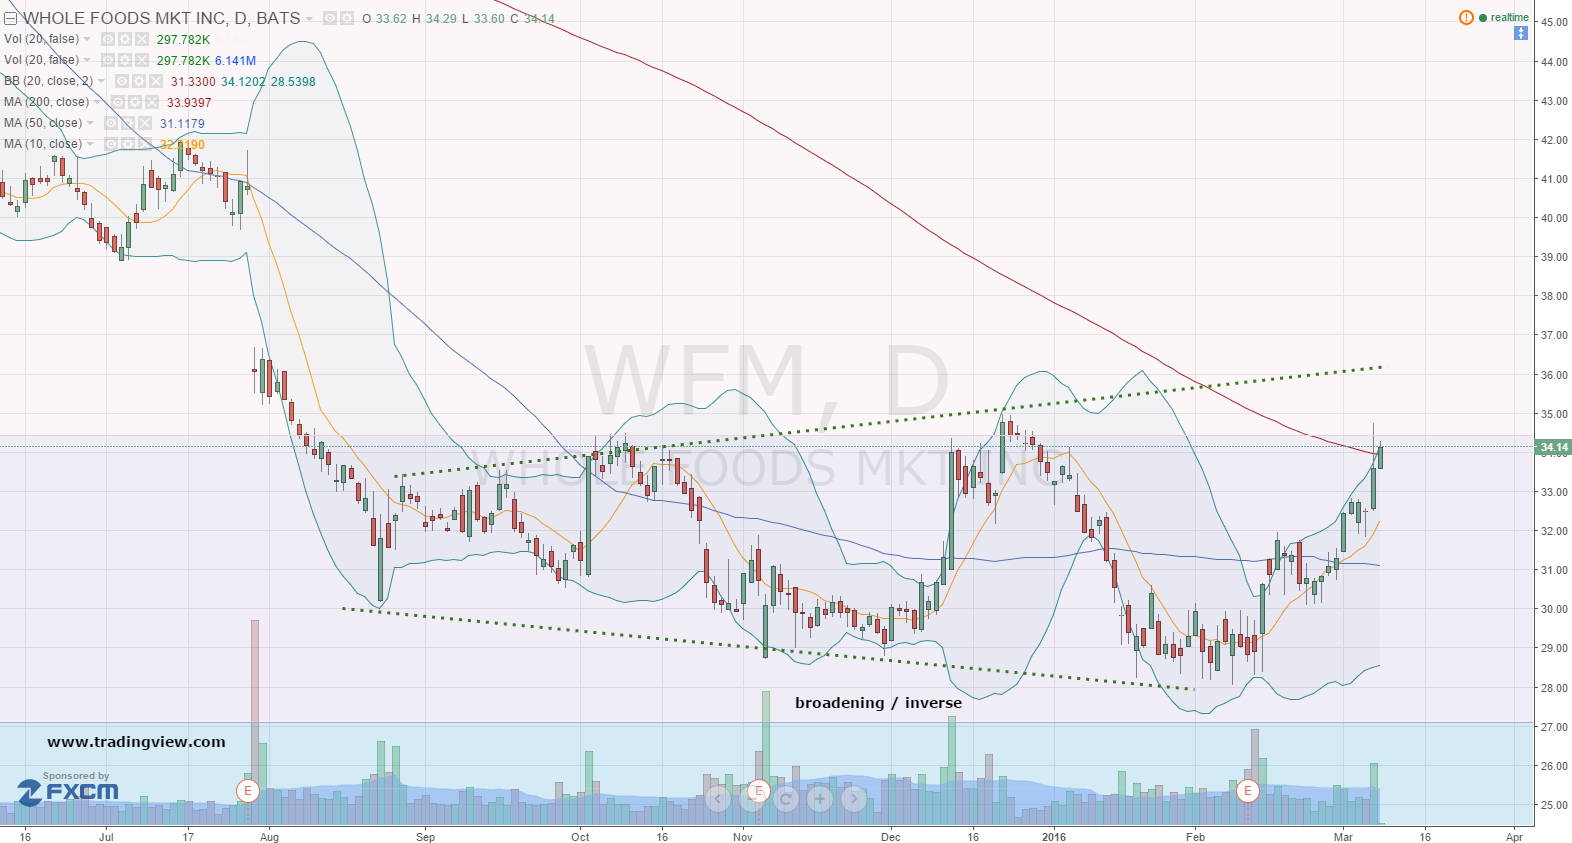 WFM Stock Chart